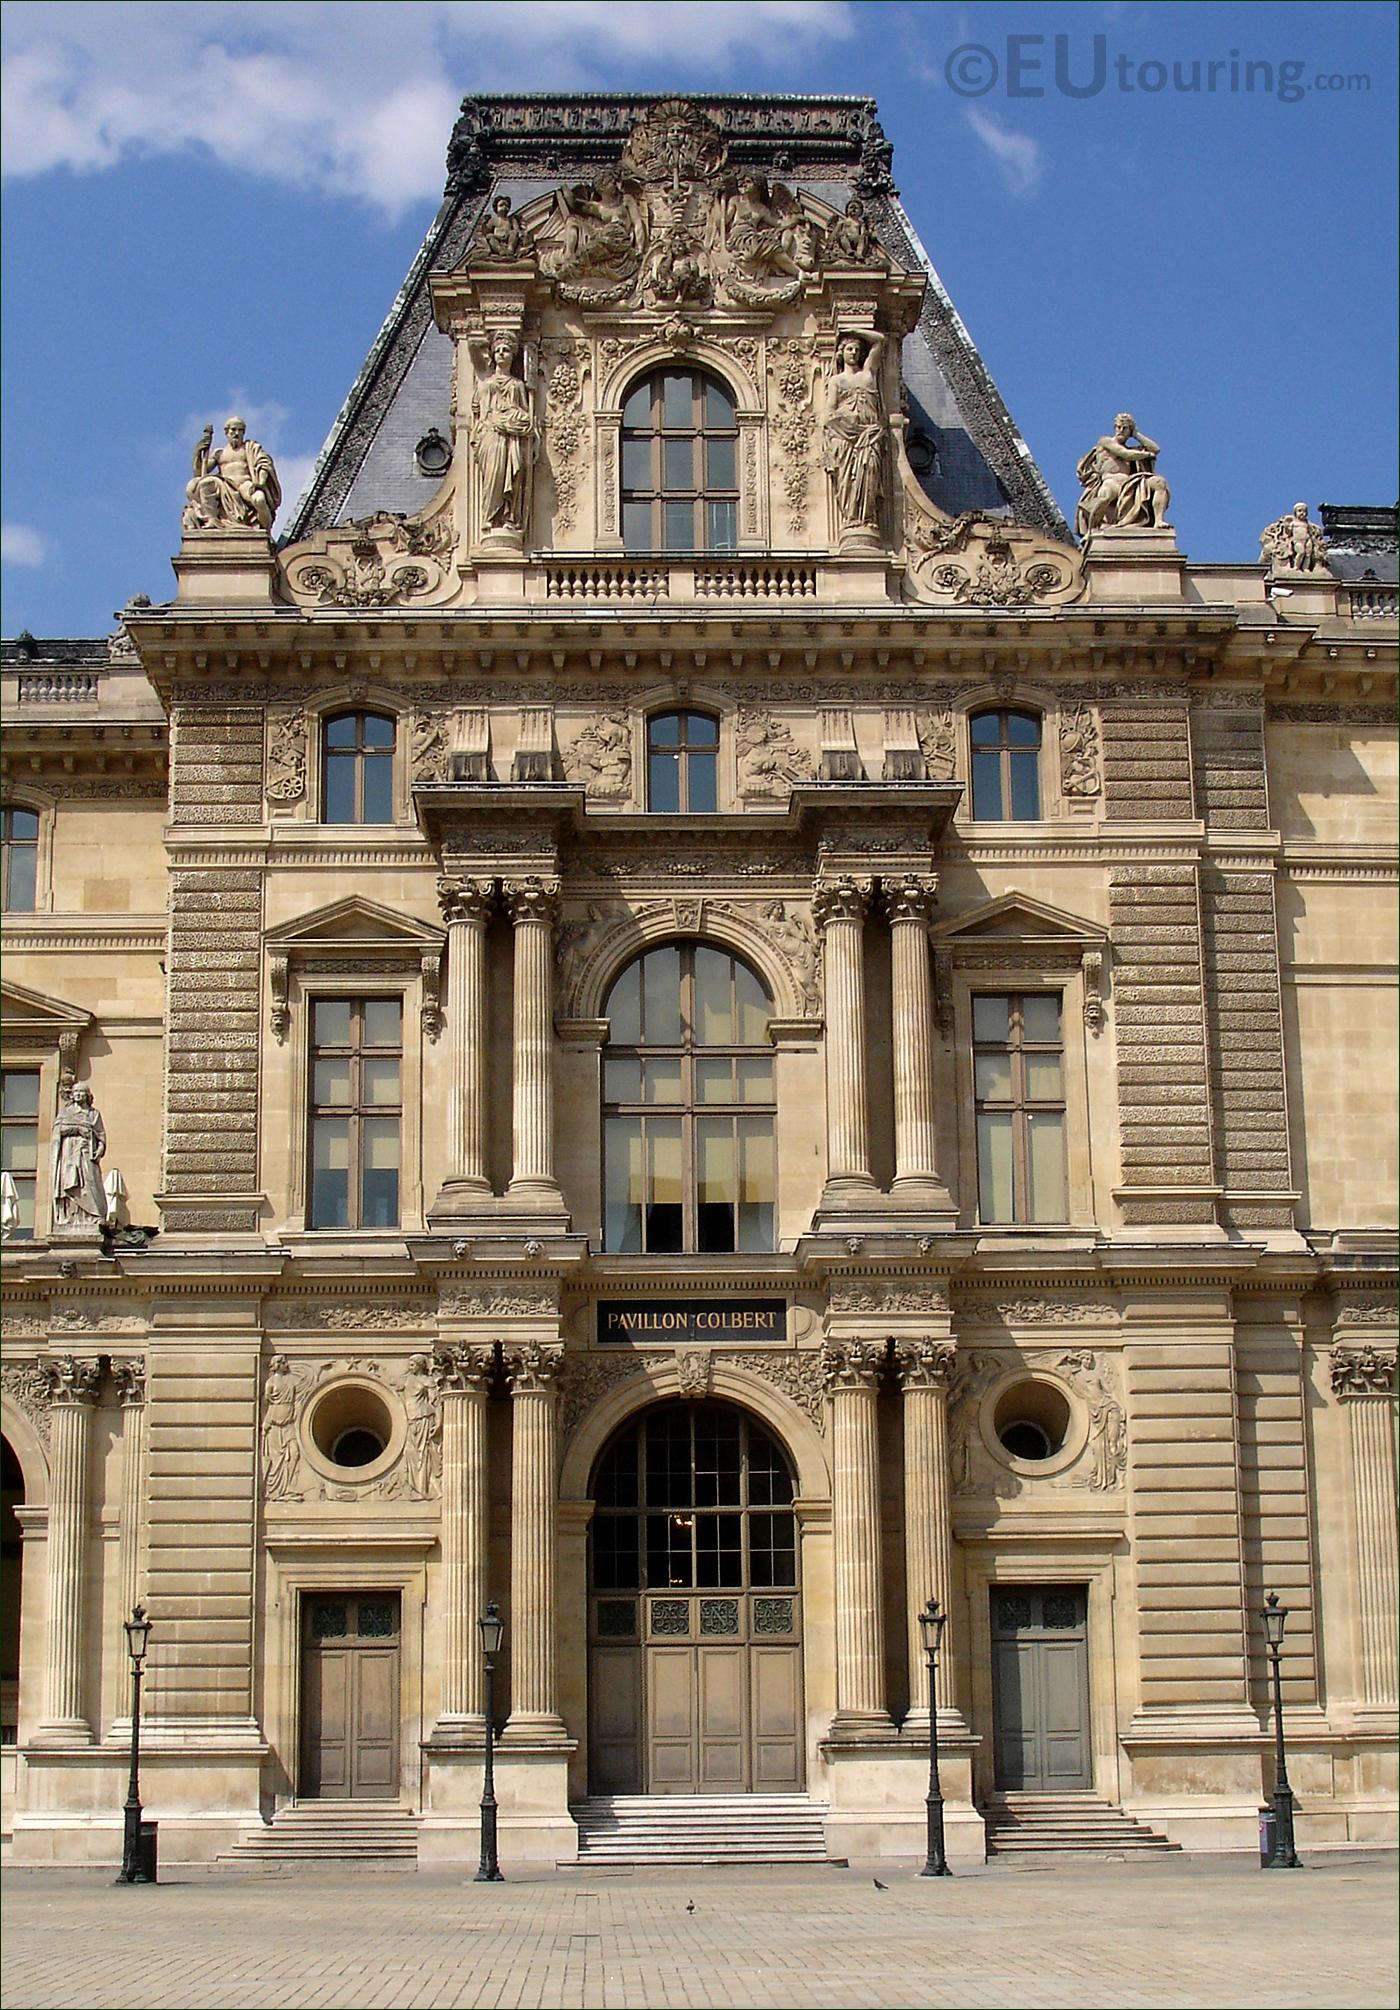 Pavillon Colbert at the Louvre